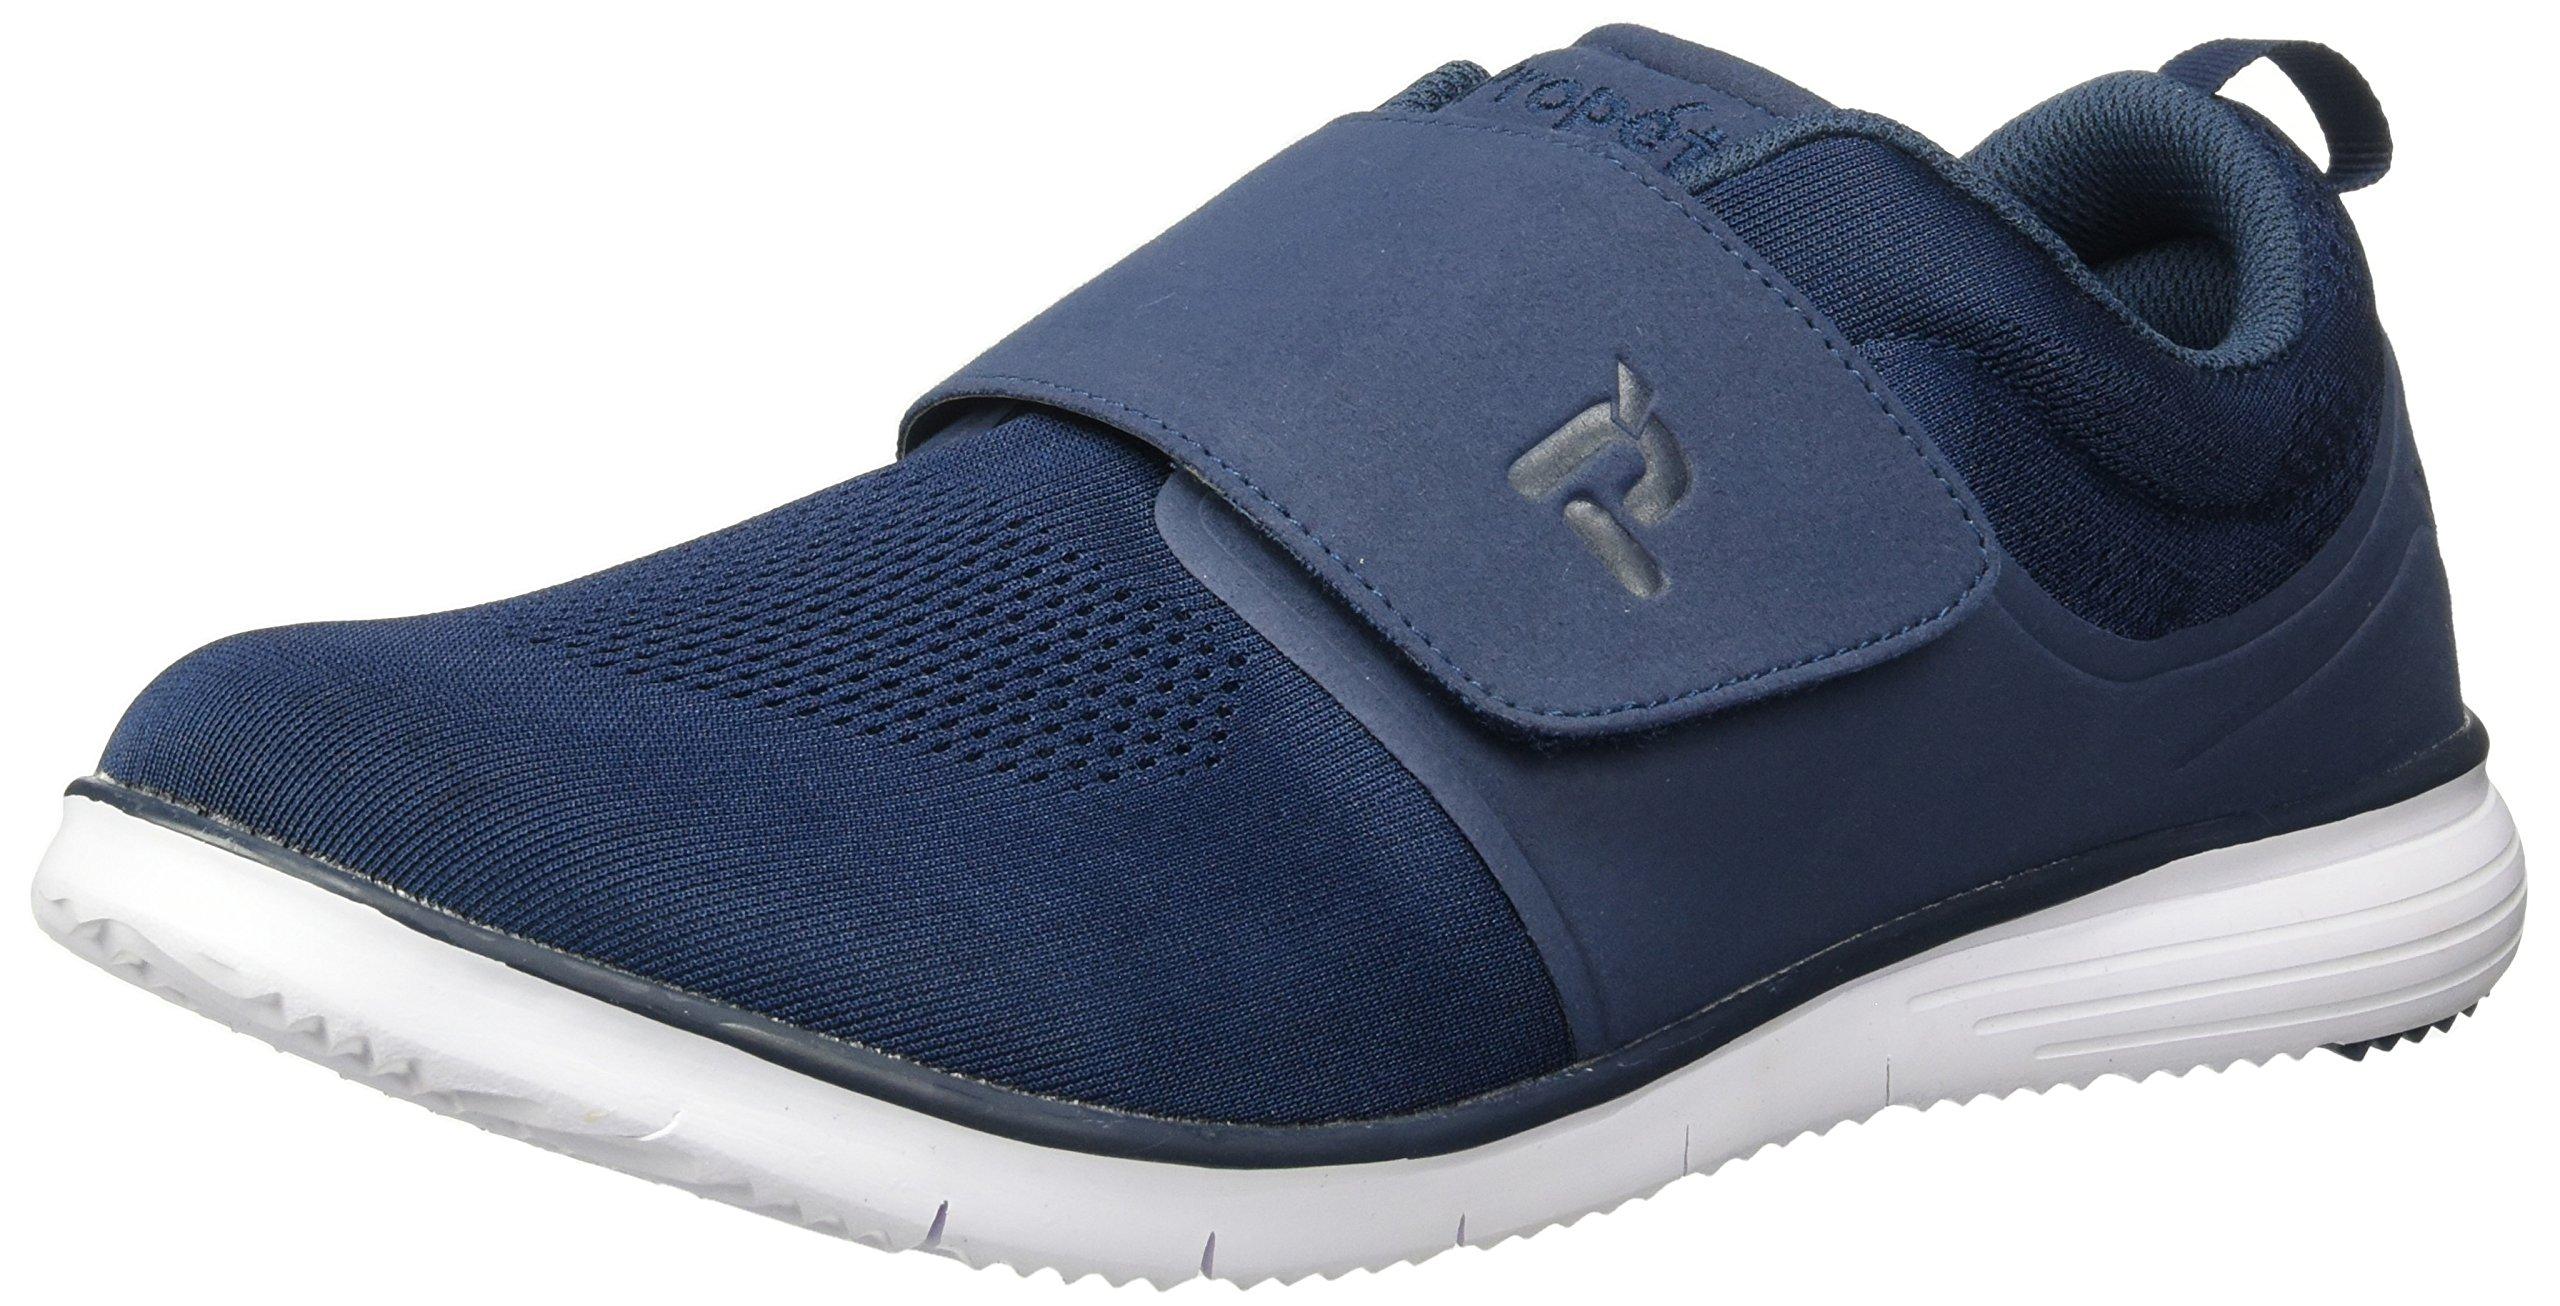 Propet Men's TravelFit Strap Walking Shoe, Navy, 14 5E US